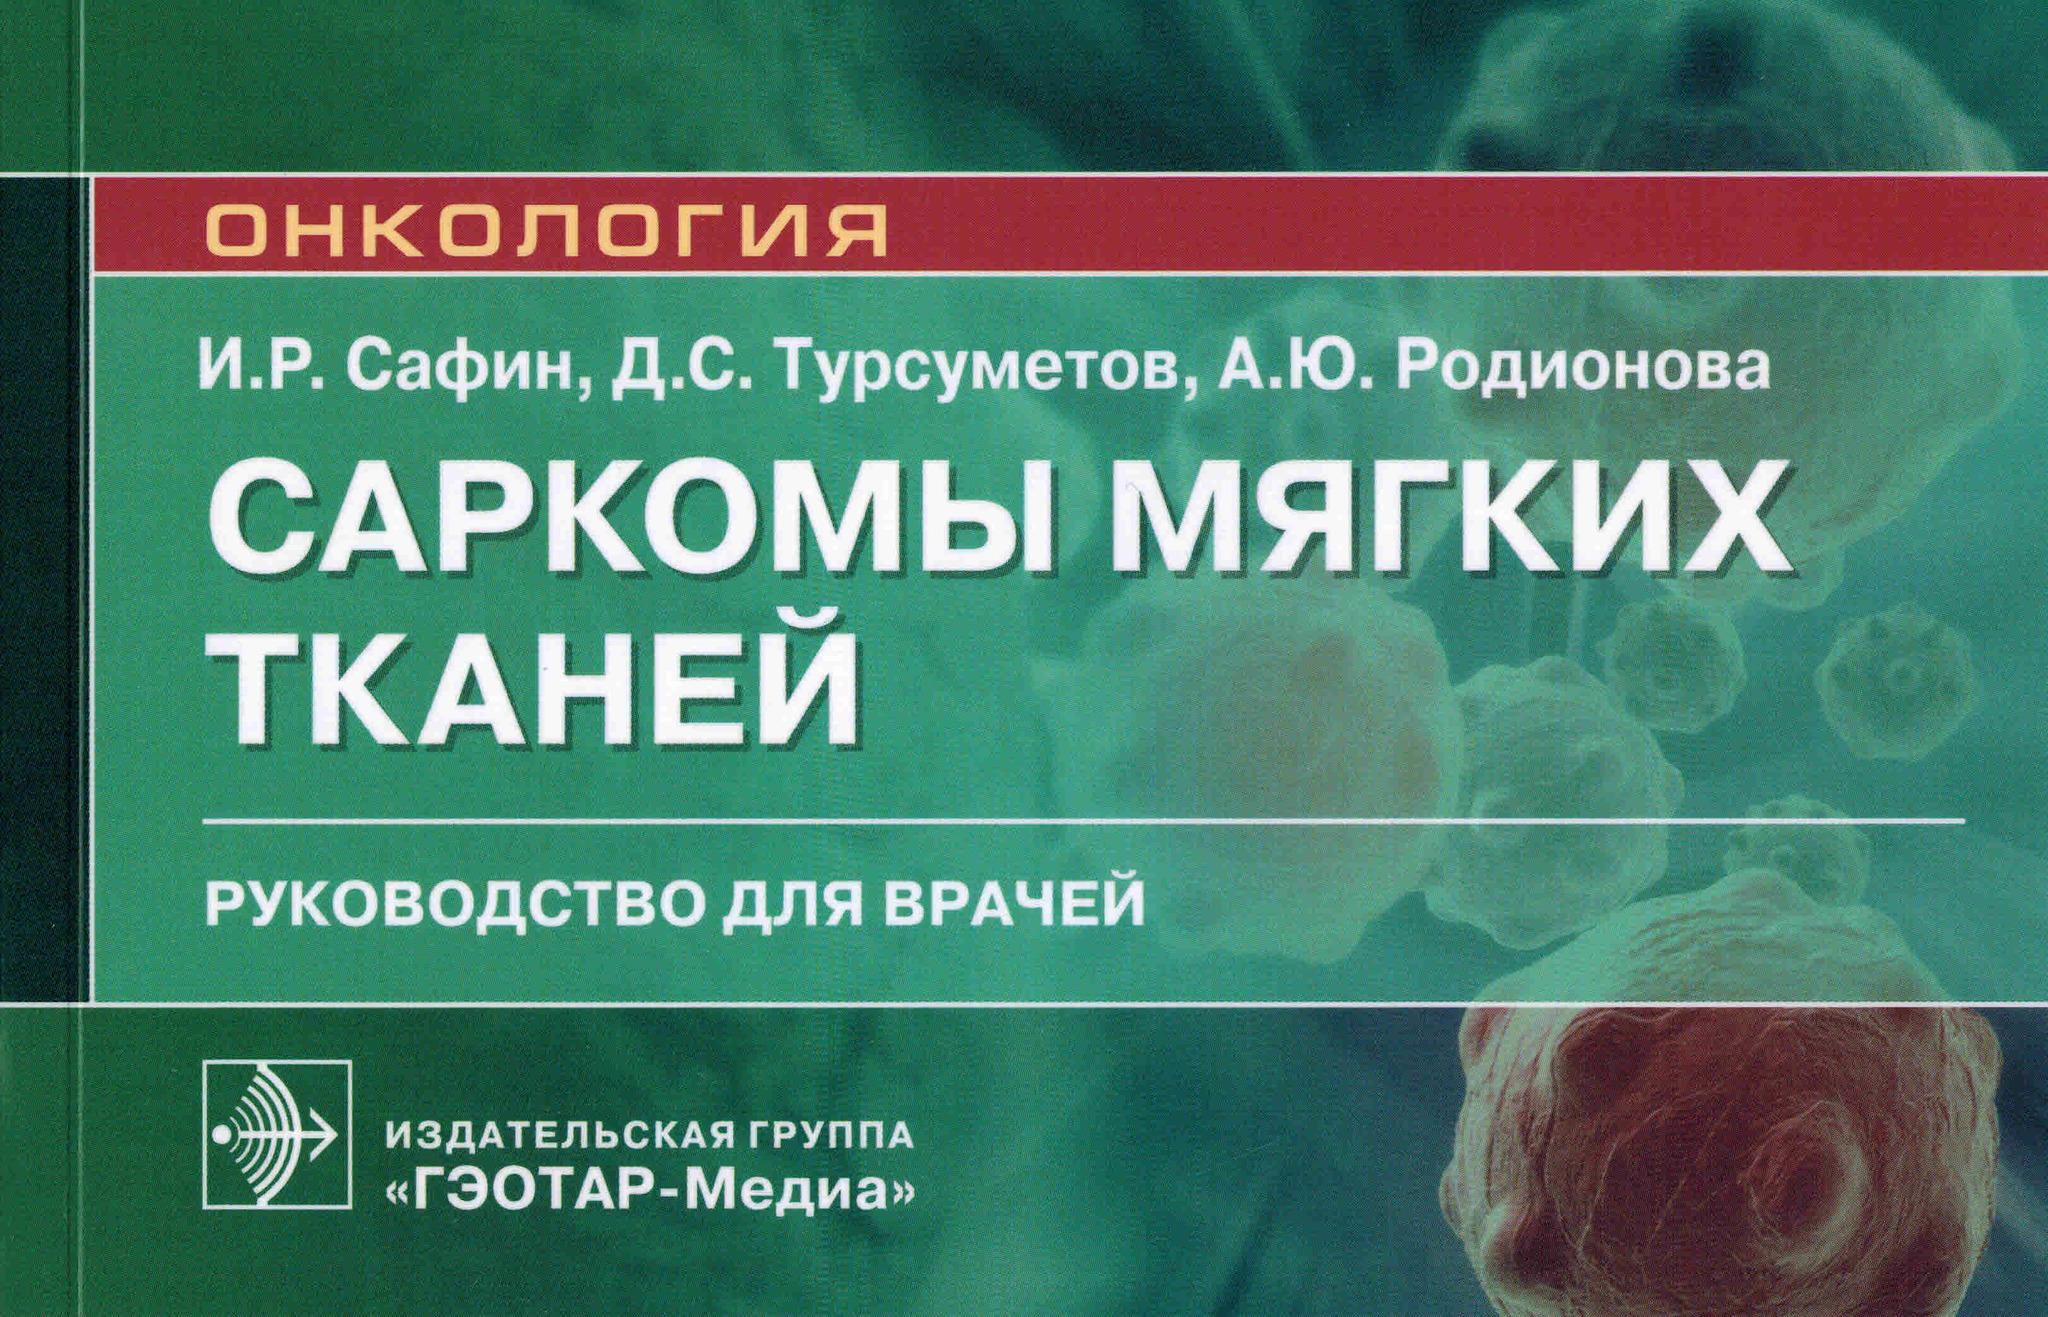 Новинки Саркомы мягких тканей: руководство smtonkko.jpg